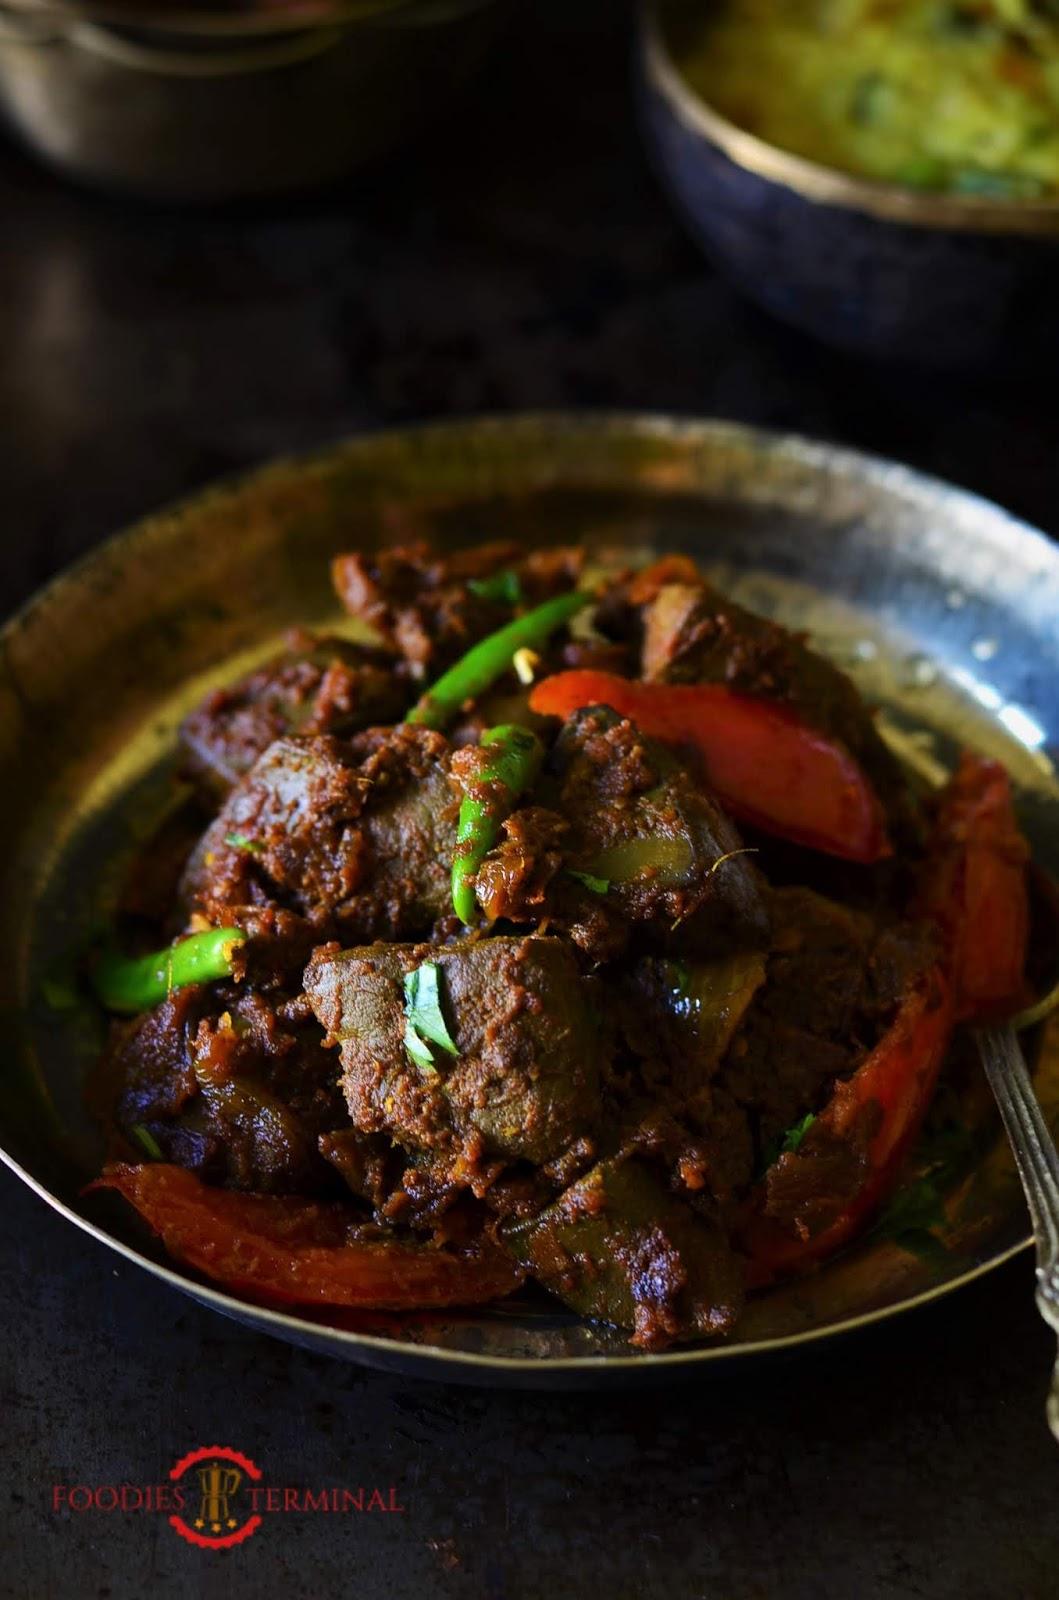 mutton liver stir-fry, bengali metey kosha recipe, mutton bhaja recipe, goat liver stir-fry recipe, quick mutton recipe, indian cuisine, quick mutton liver stir fry recipe, goat liver stir fry recipe.